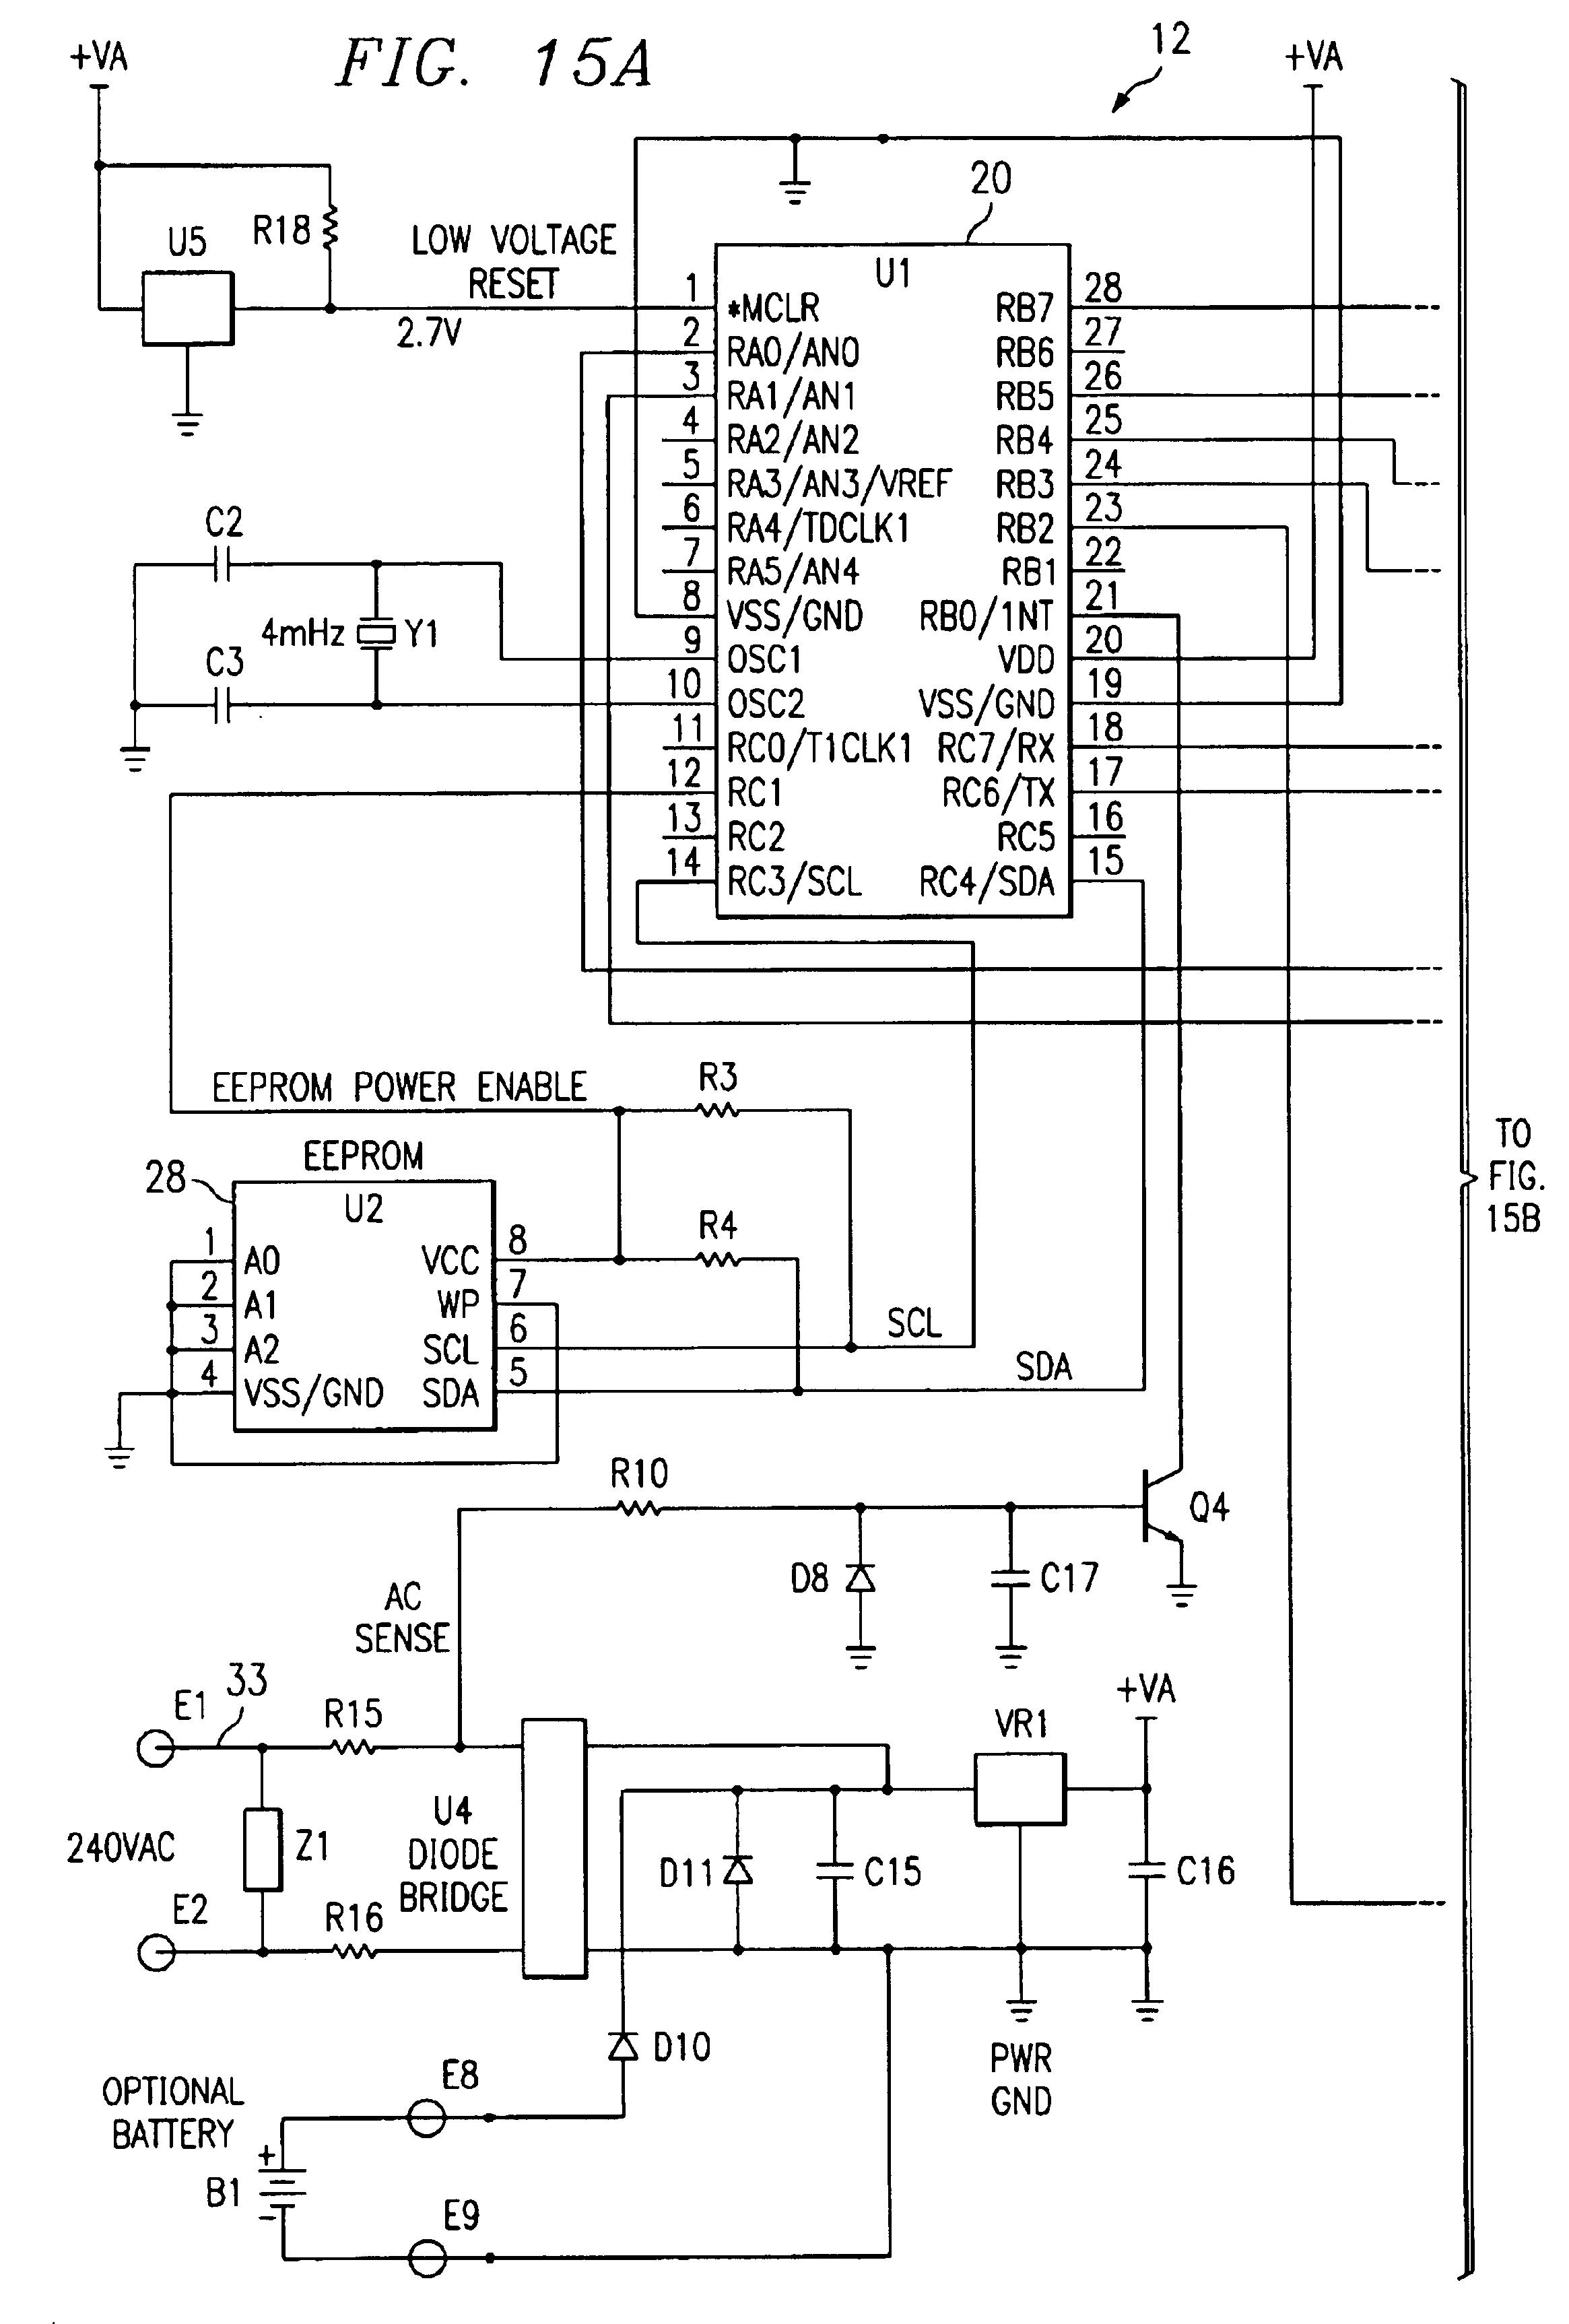 Rc4 Wiring Diagram -Fuse Box For Fiat Ducato   Begeboy Wiring Diagram SourceBegeboy Wiring Diagram Source